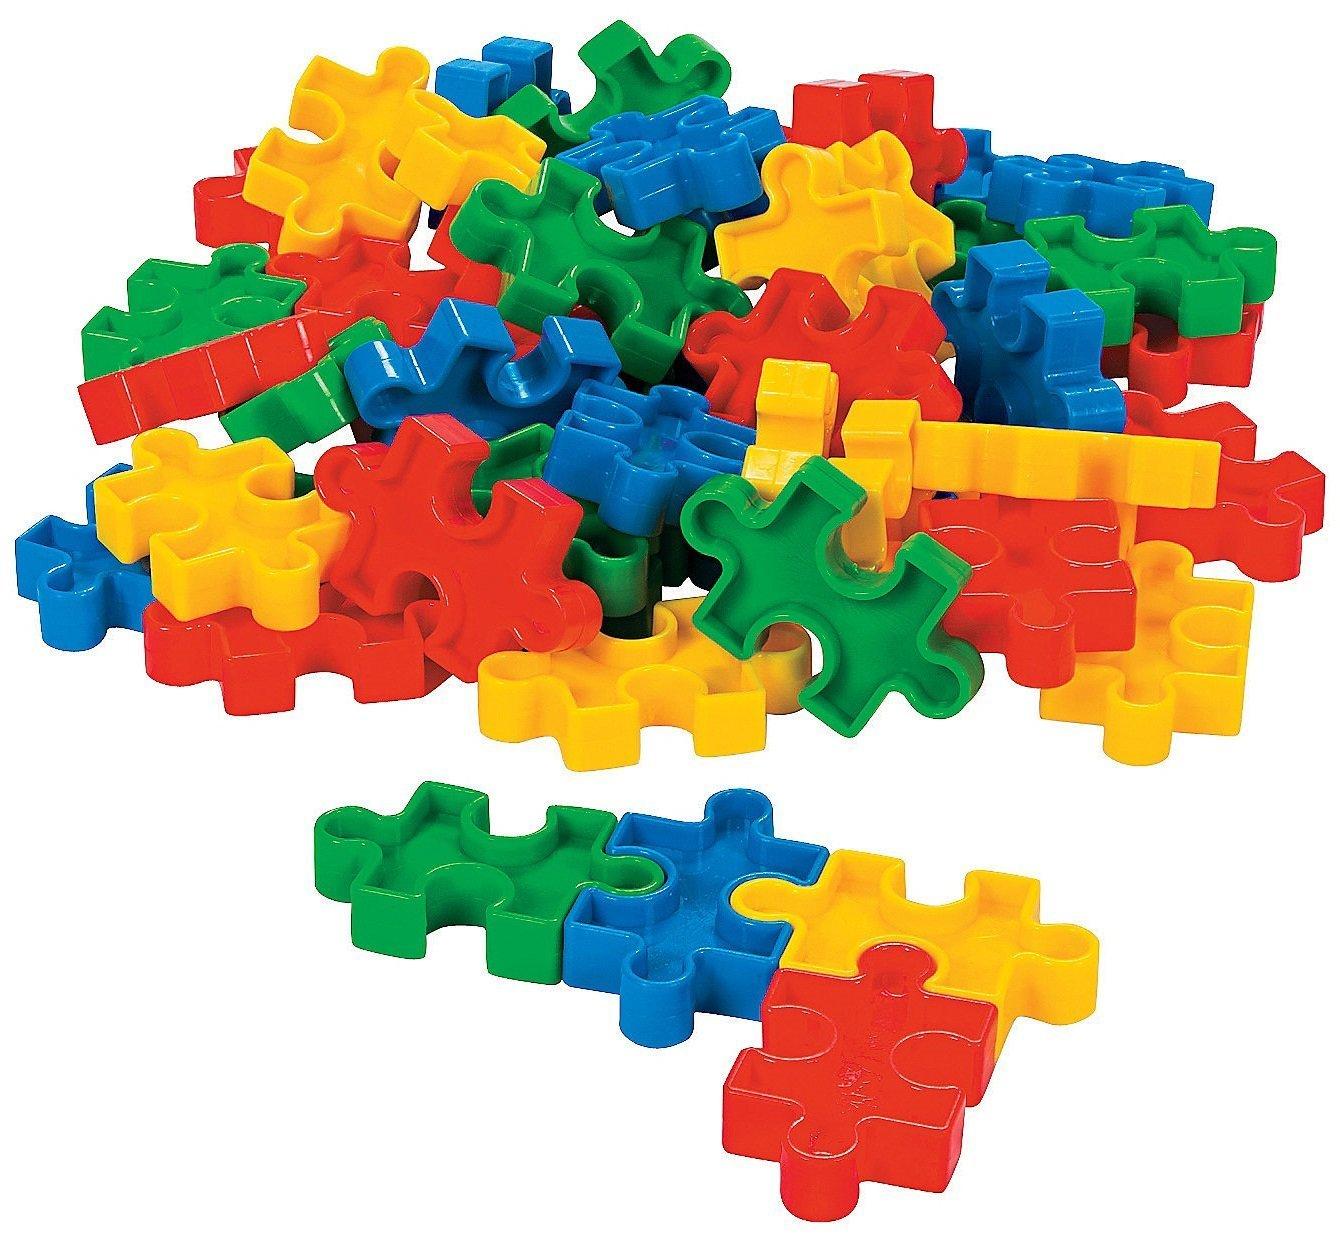 LYSB00SXBNWIK-TOYS Fun Express Puzzle-Shaped Block Set 2 1//4 X 1 3//8 50 Pcs Plastic